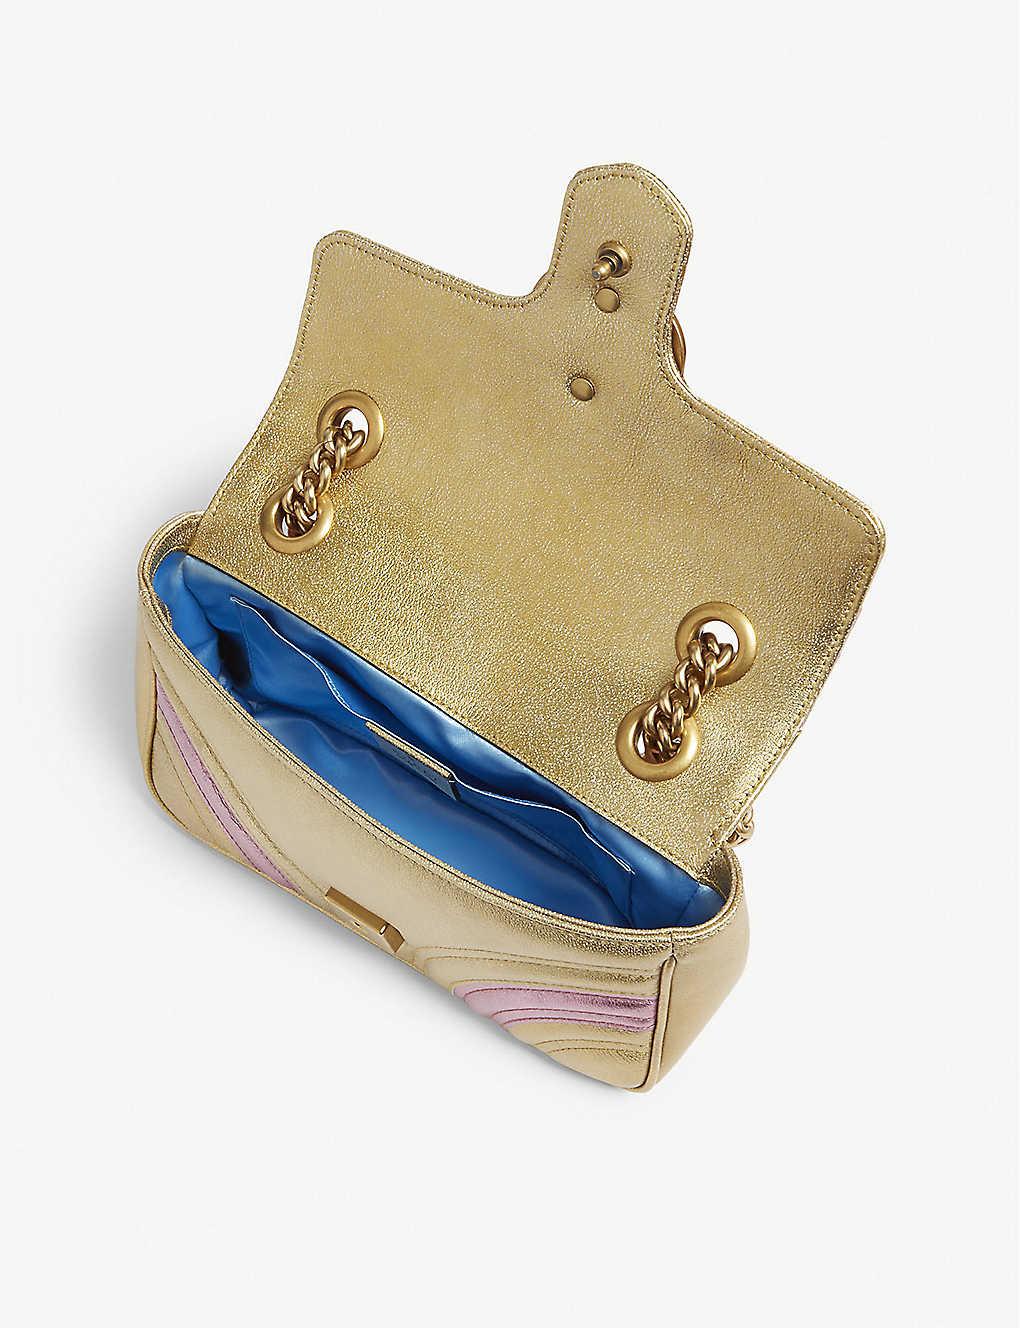 40600214d76 ... Metallic Marmont shoulder bag - Gold pink ...